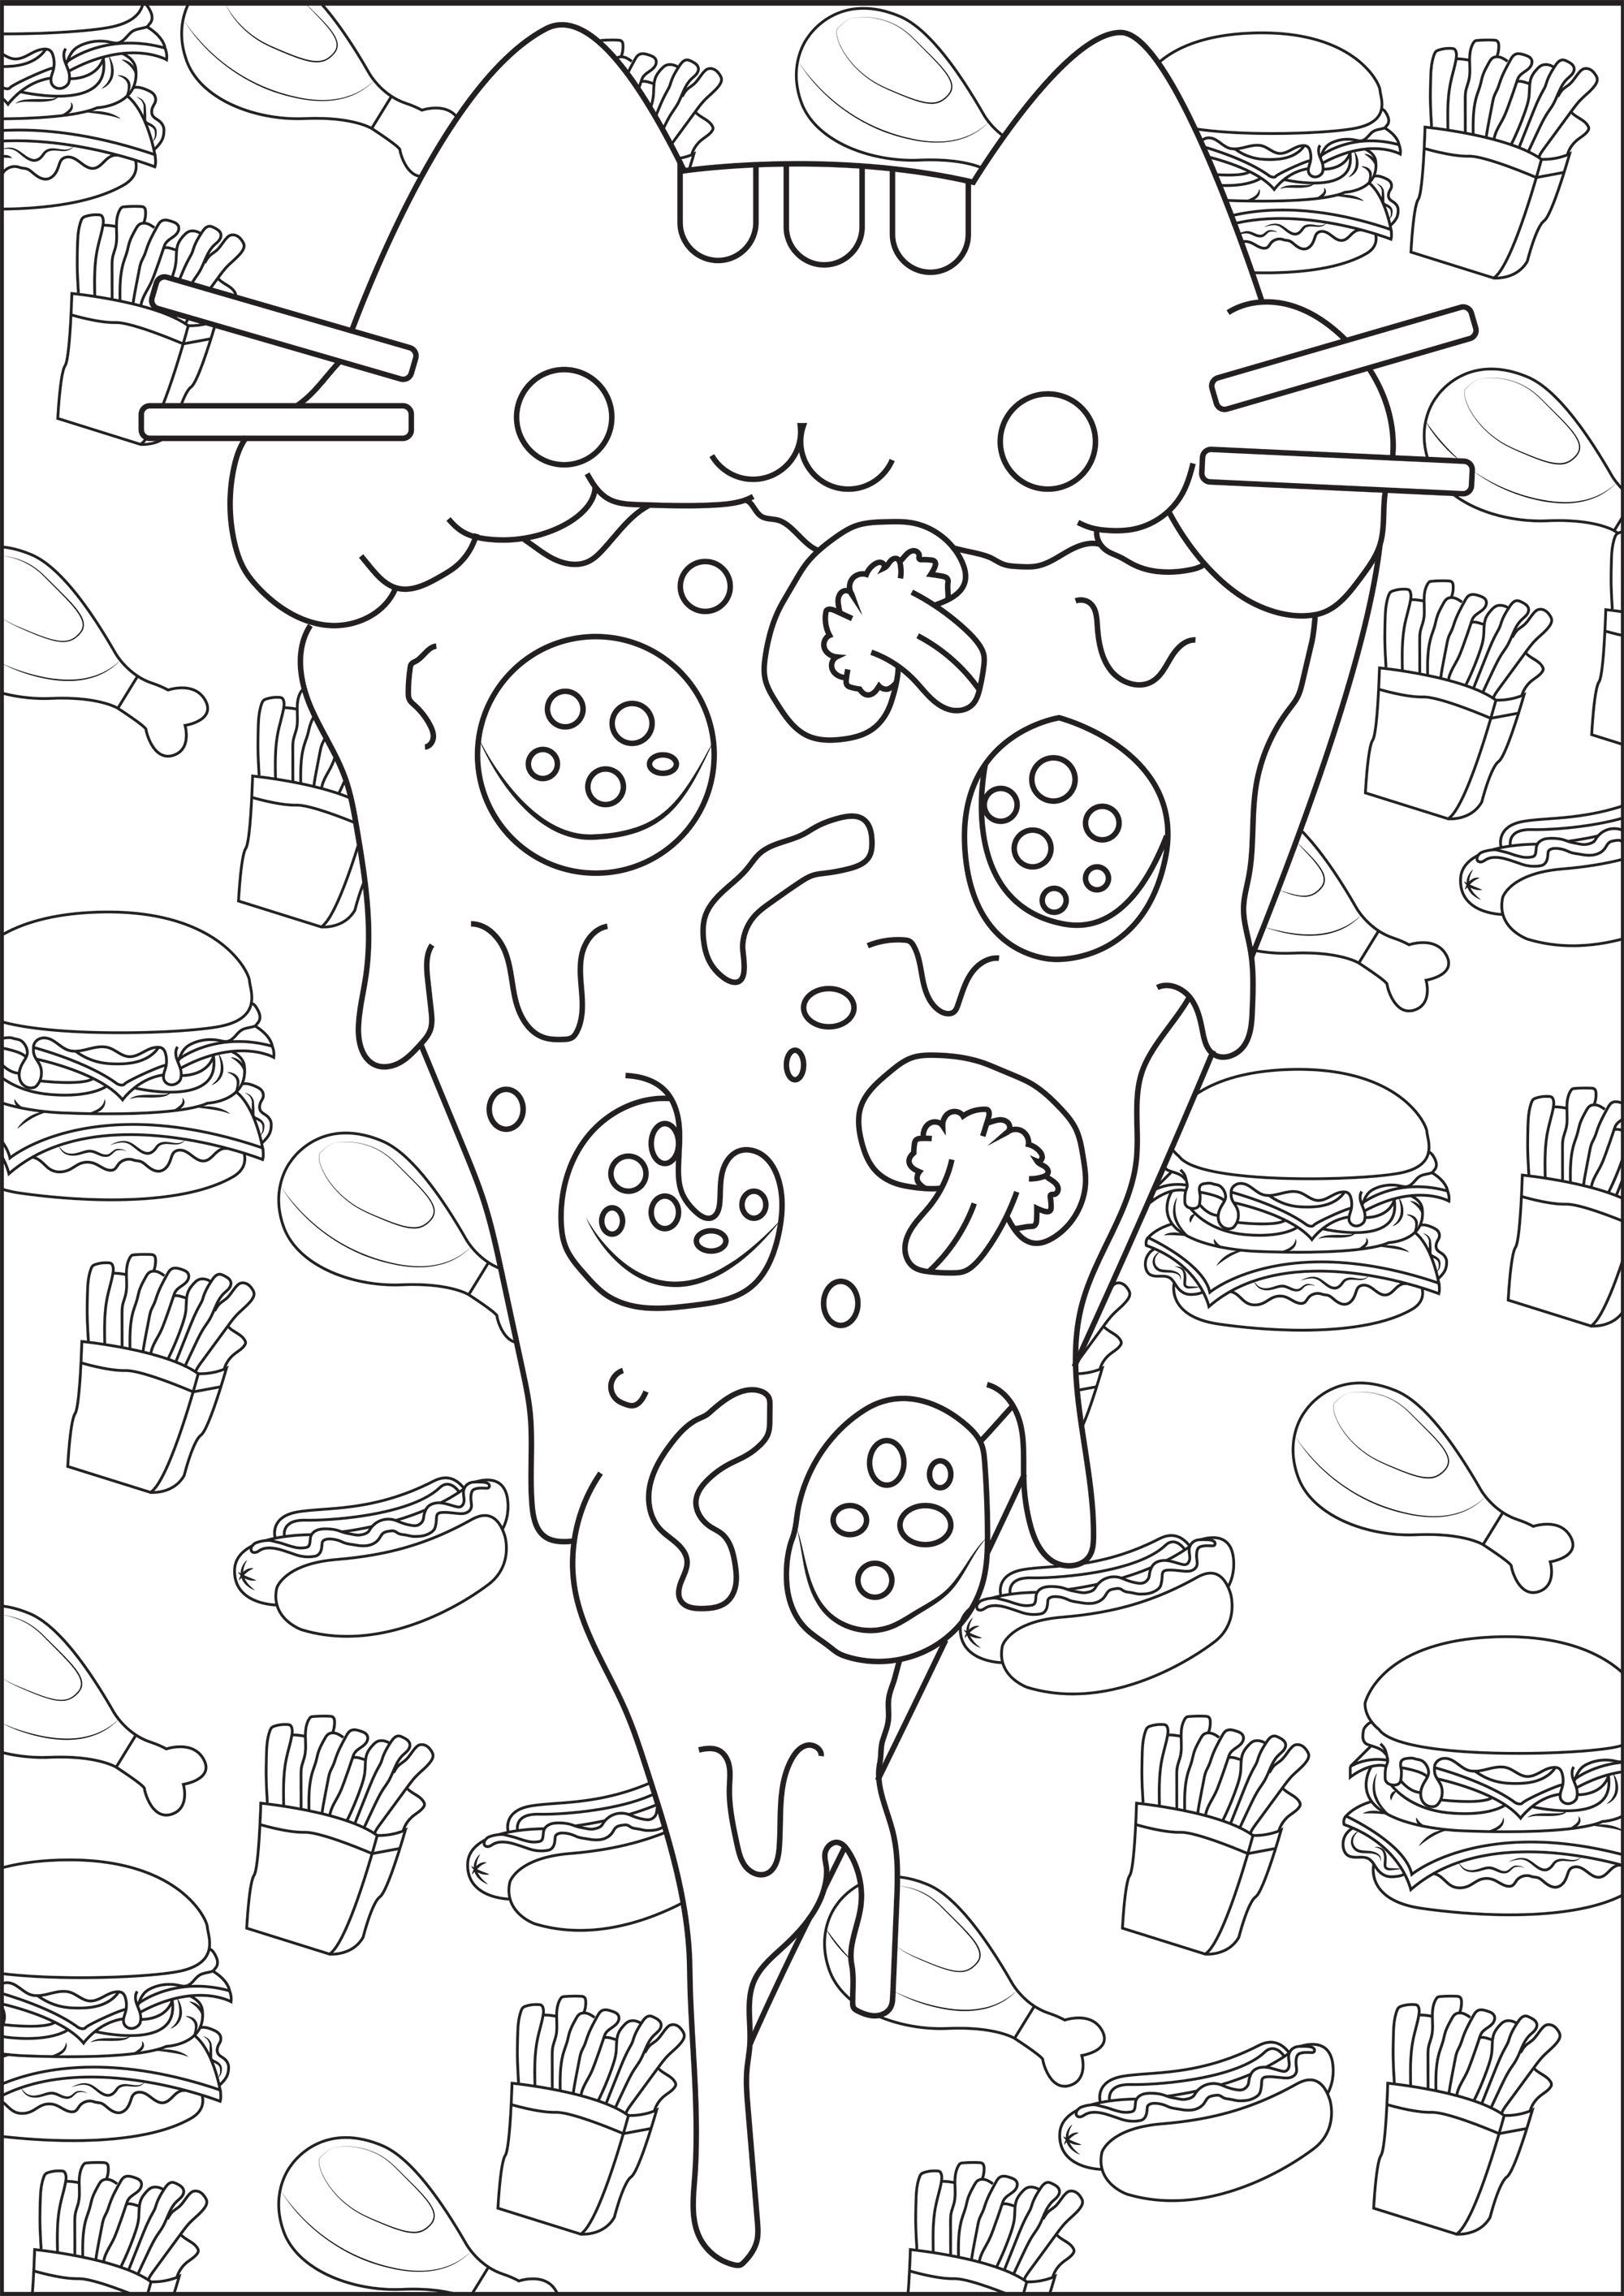 Malbuch Fur Erwachsene : Doodle art / Doodling - 3